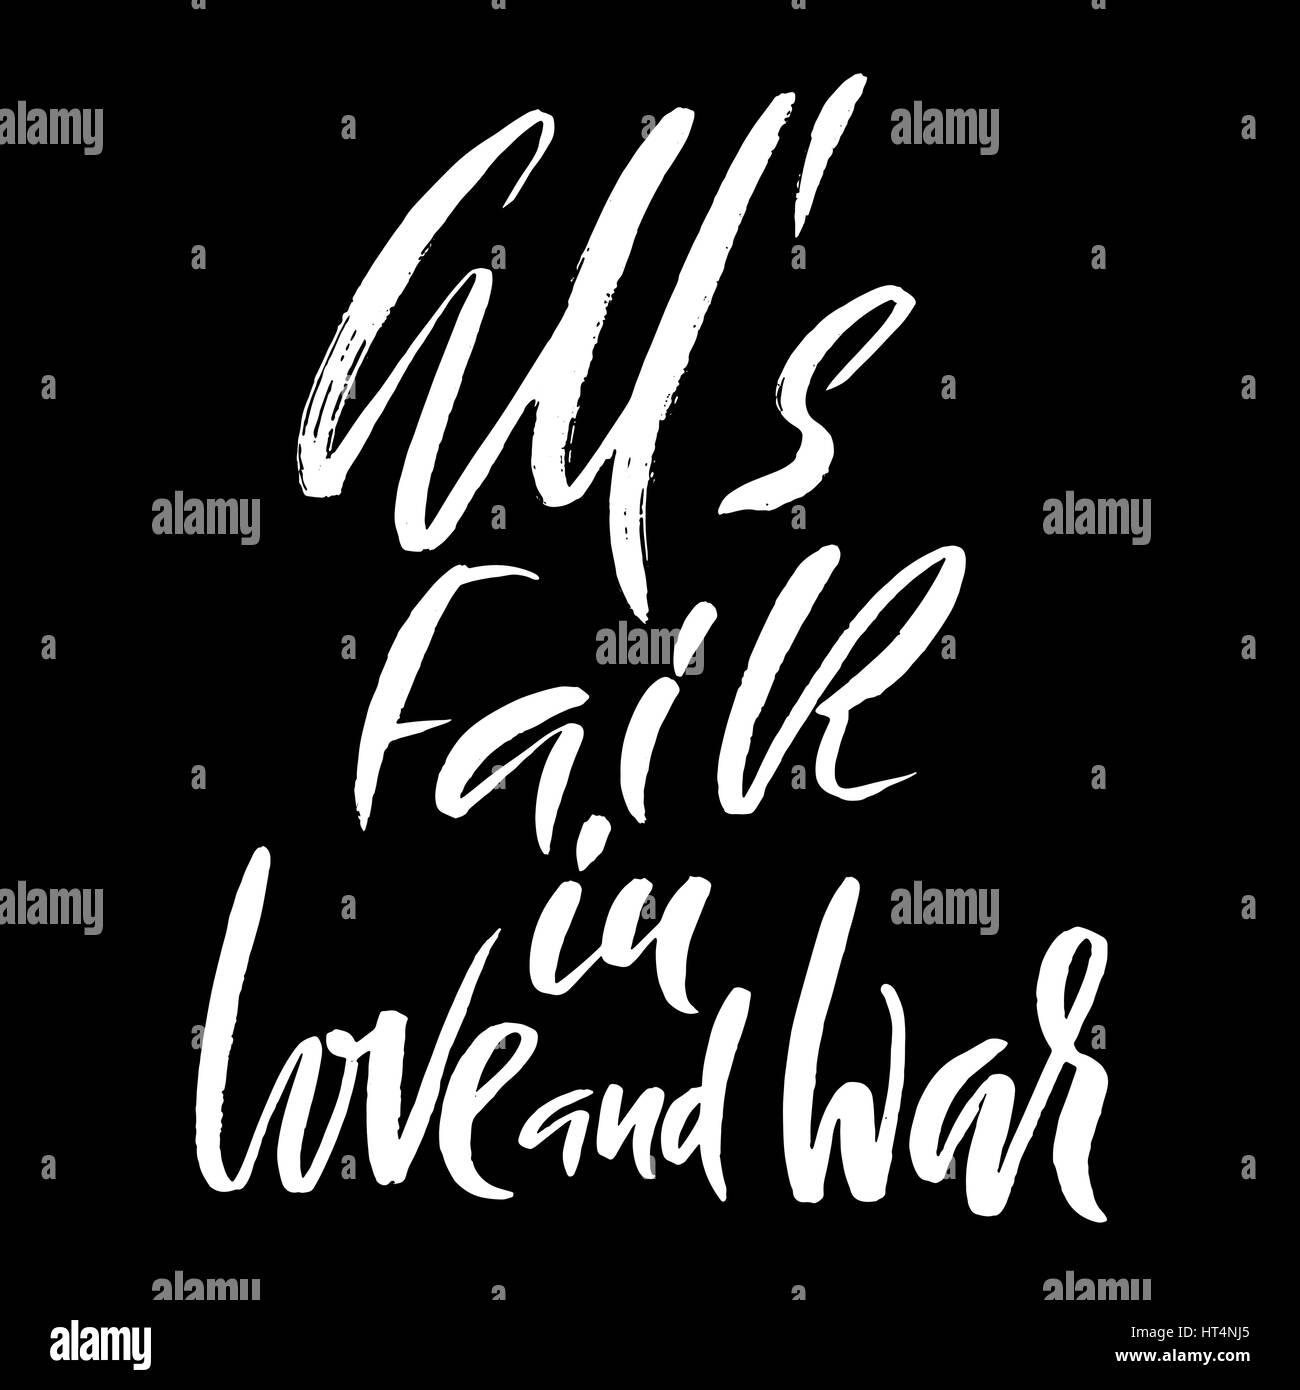 All really fair love and war